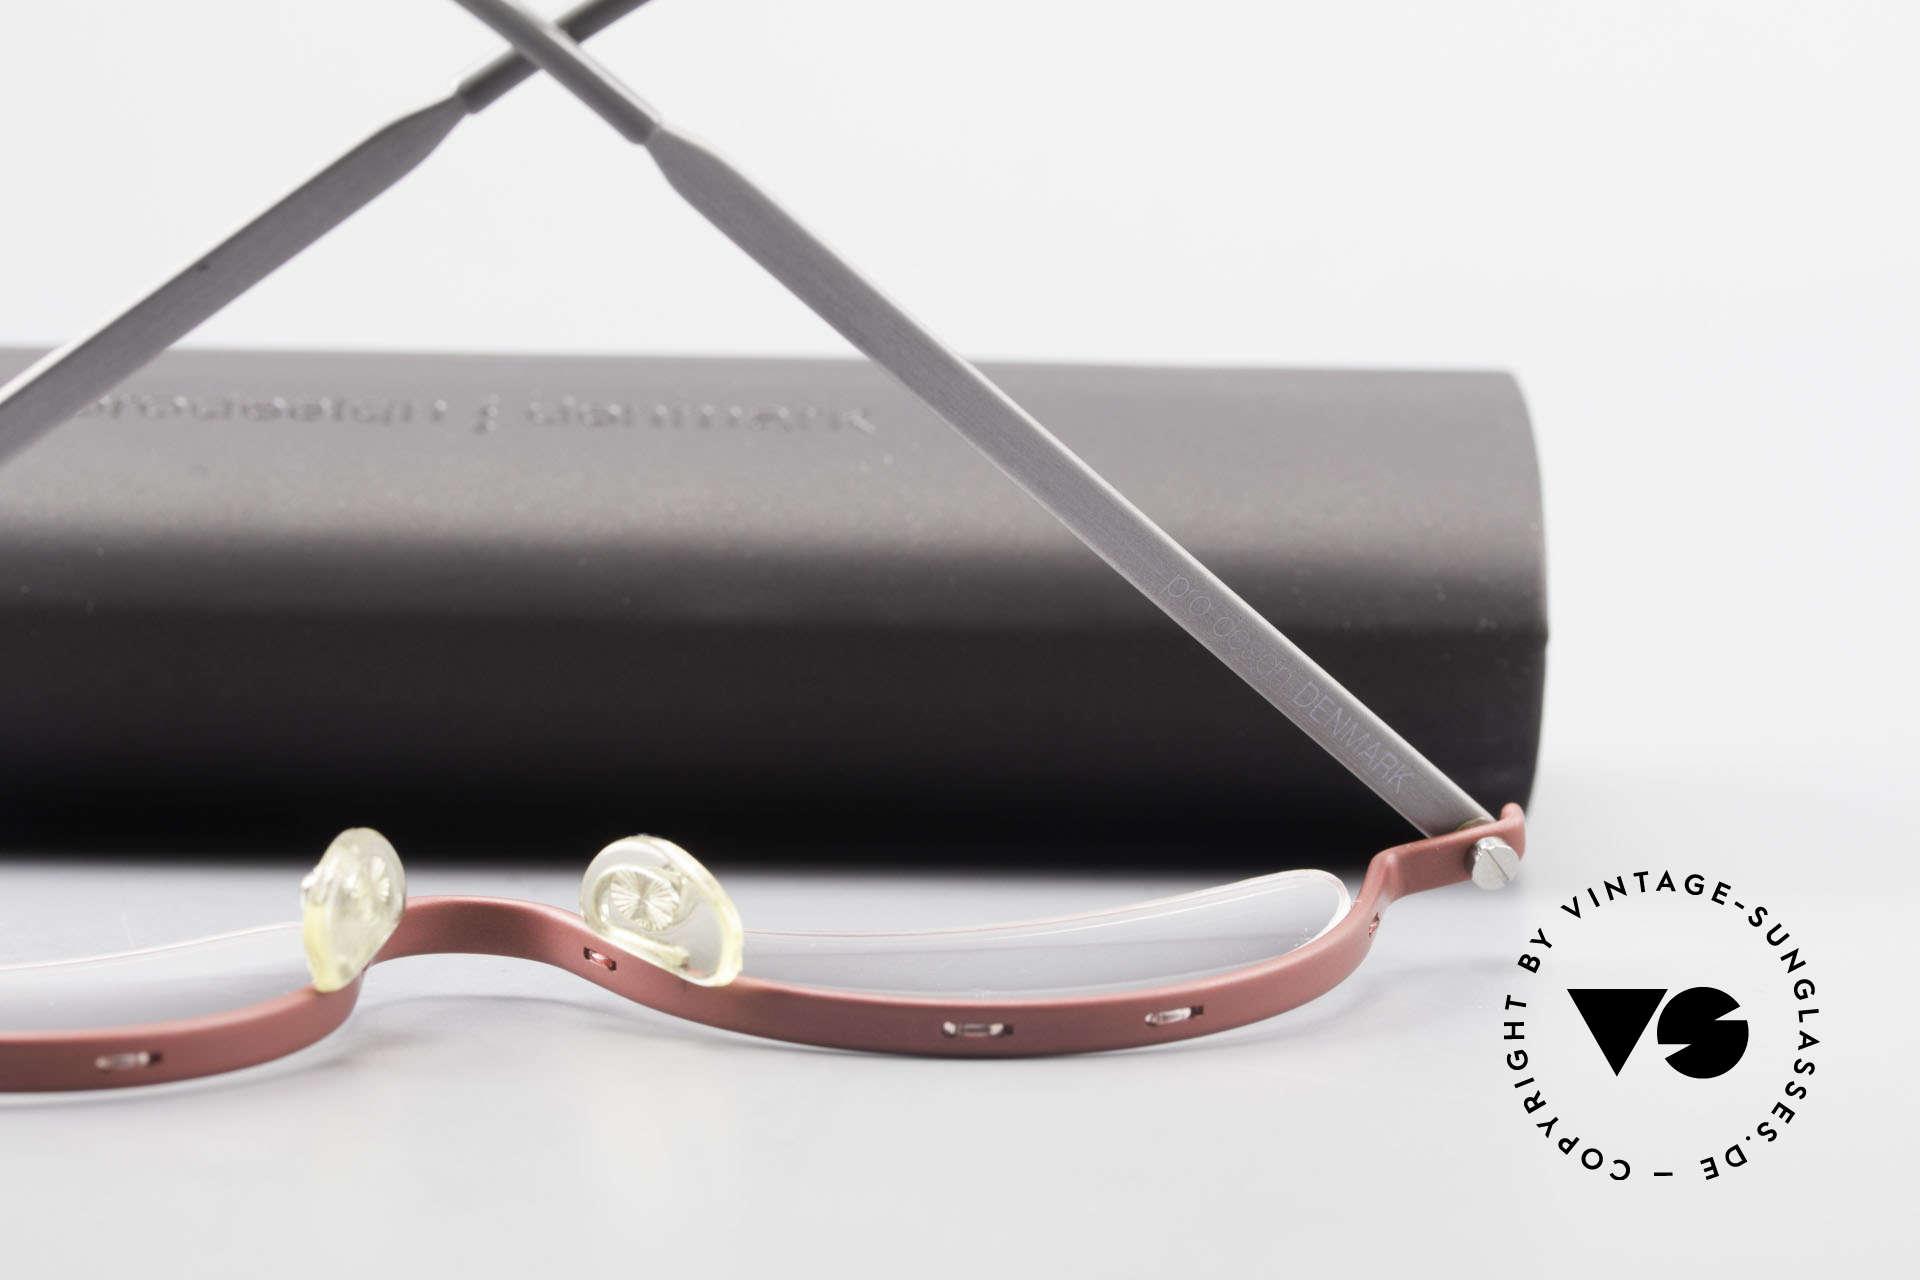 ProDesign No11 Gail Spence Design Eyeglasses, unworn single item (like all our famous movie frames), Made for Women